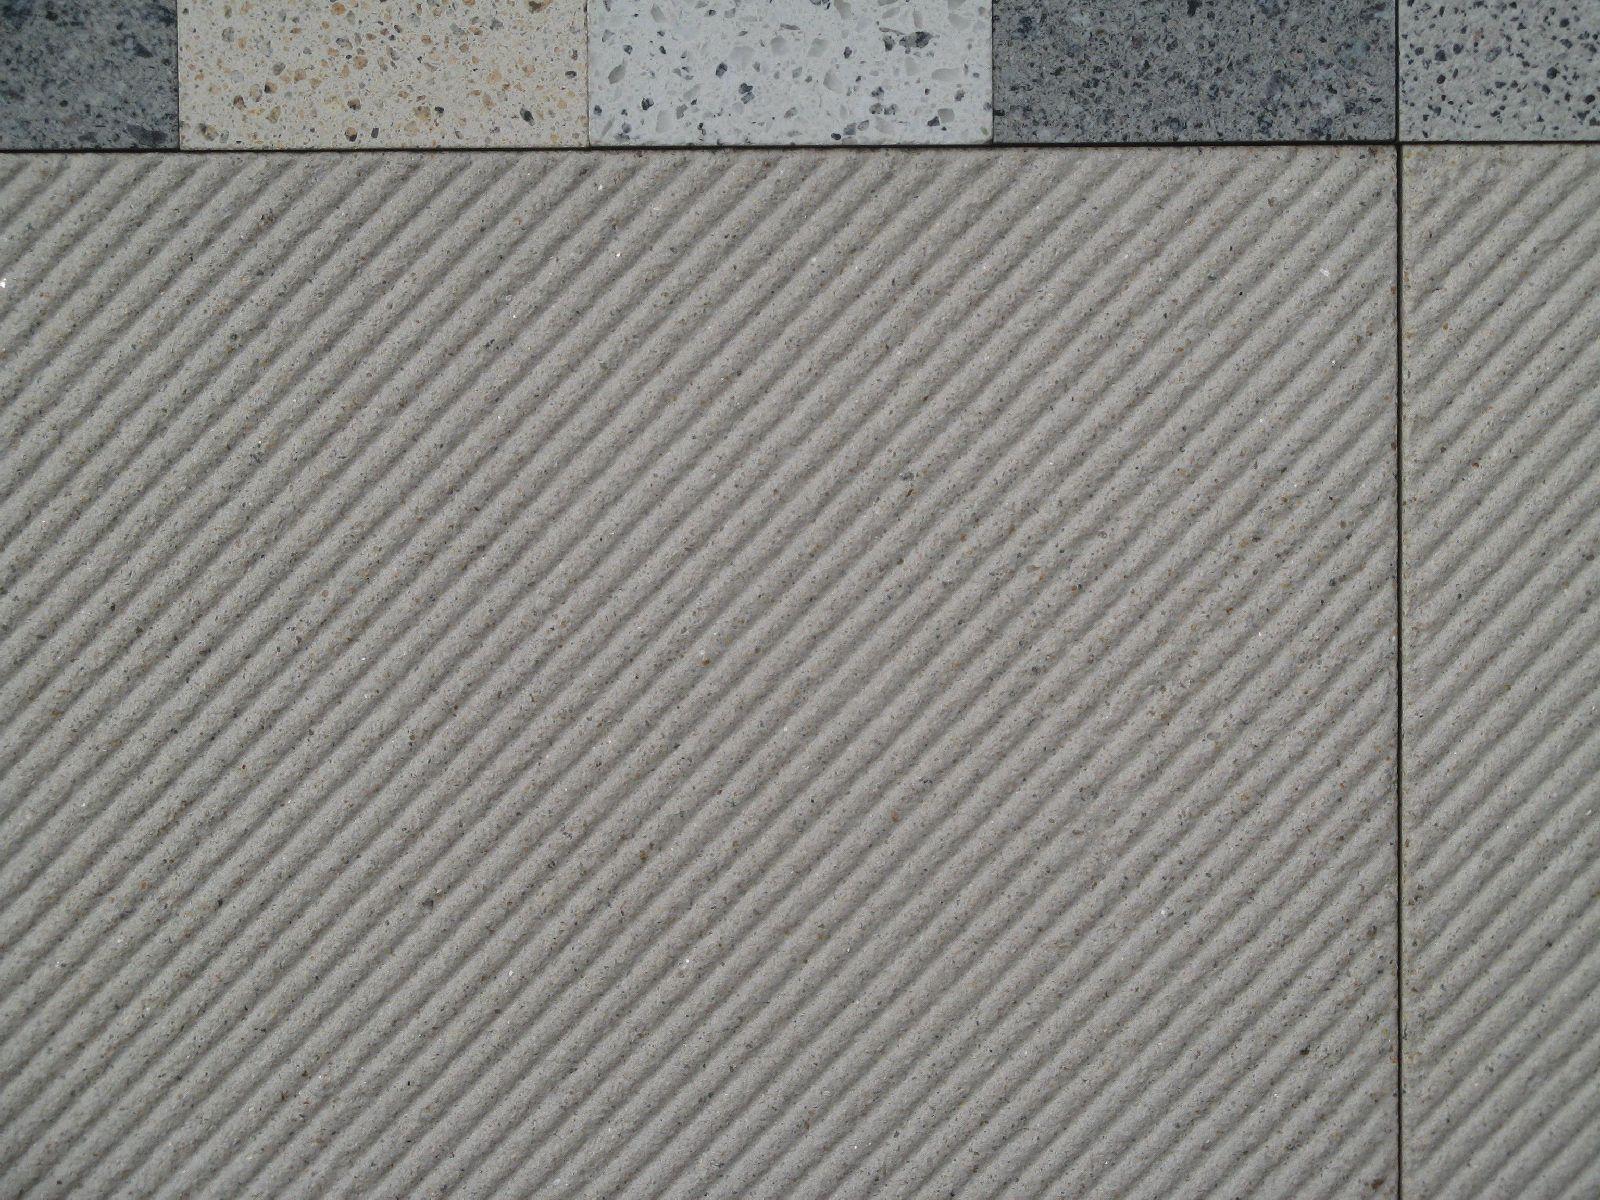 Stone_Texture_B_2952